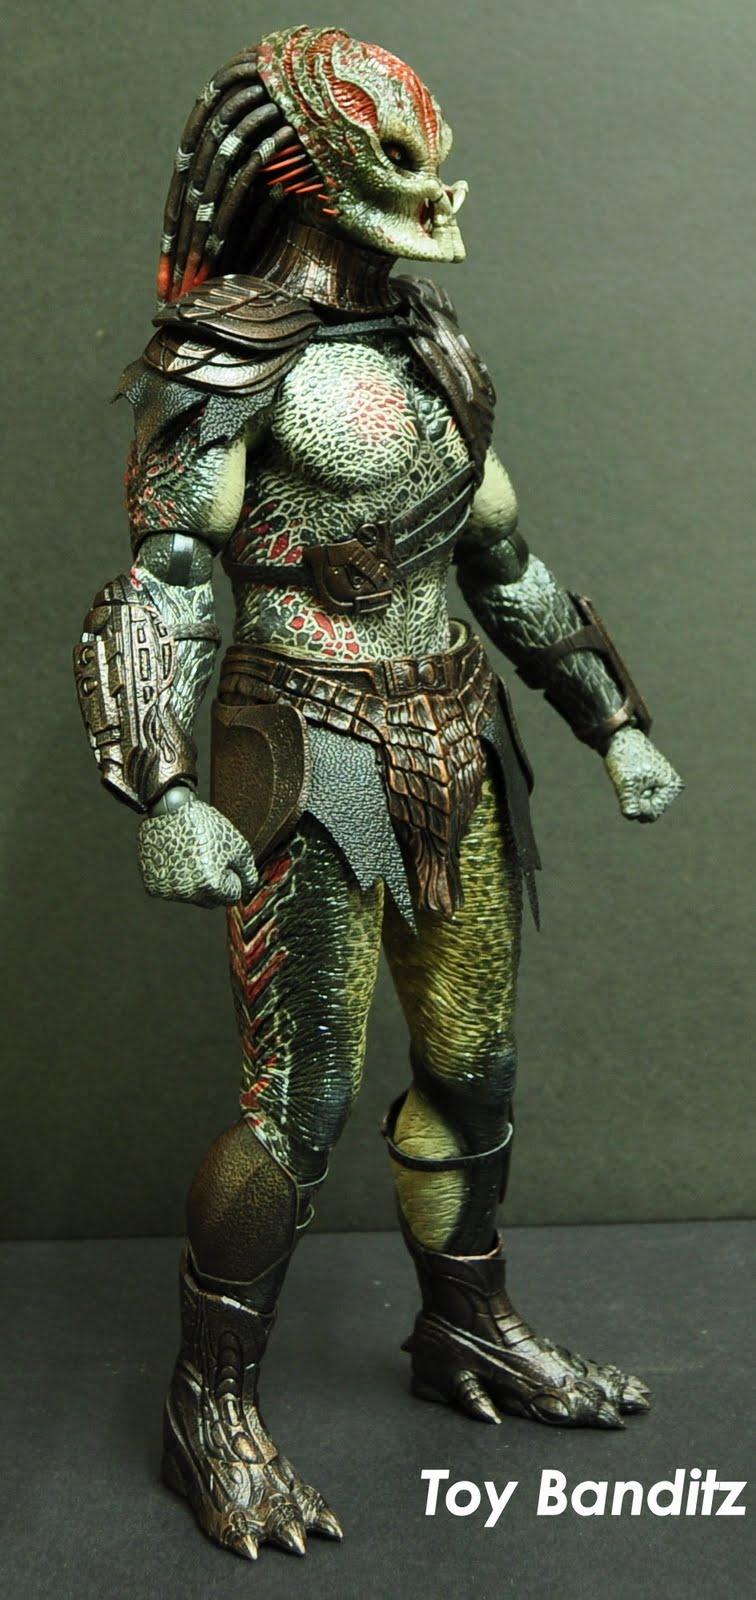 Toy Banditz Berserker Predator By Hot Toys